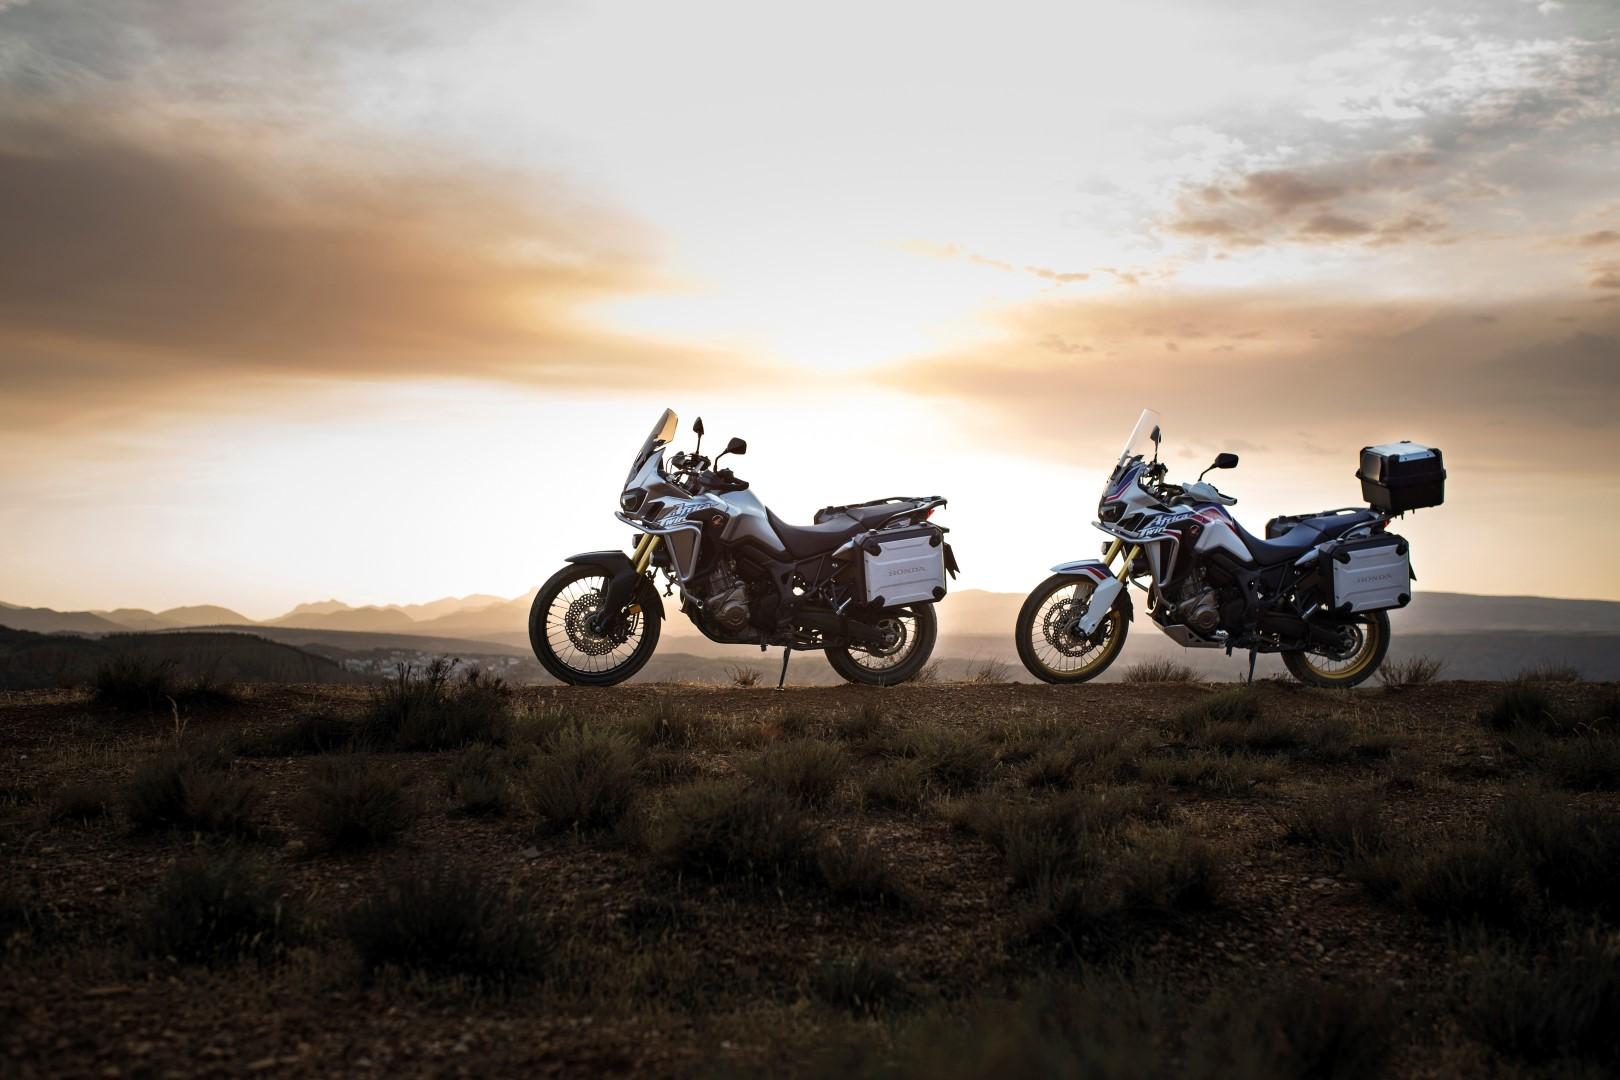 Honda Africa Twin Morocco Epic Tour, fotos